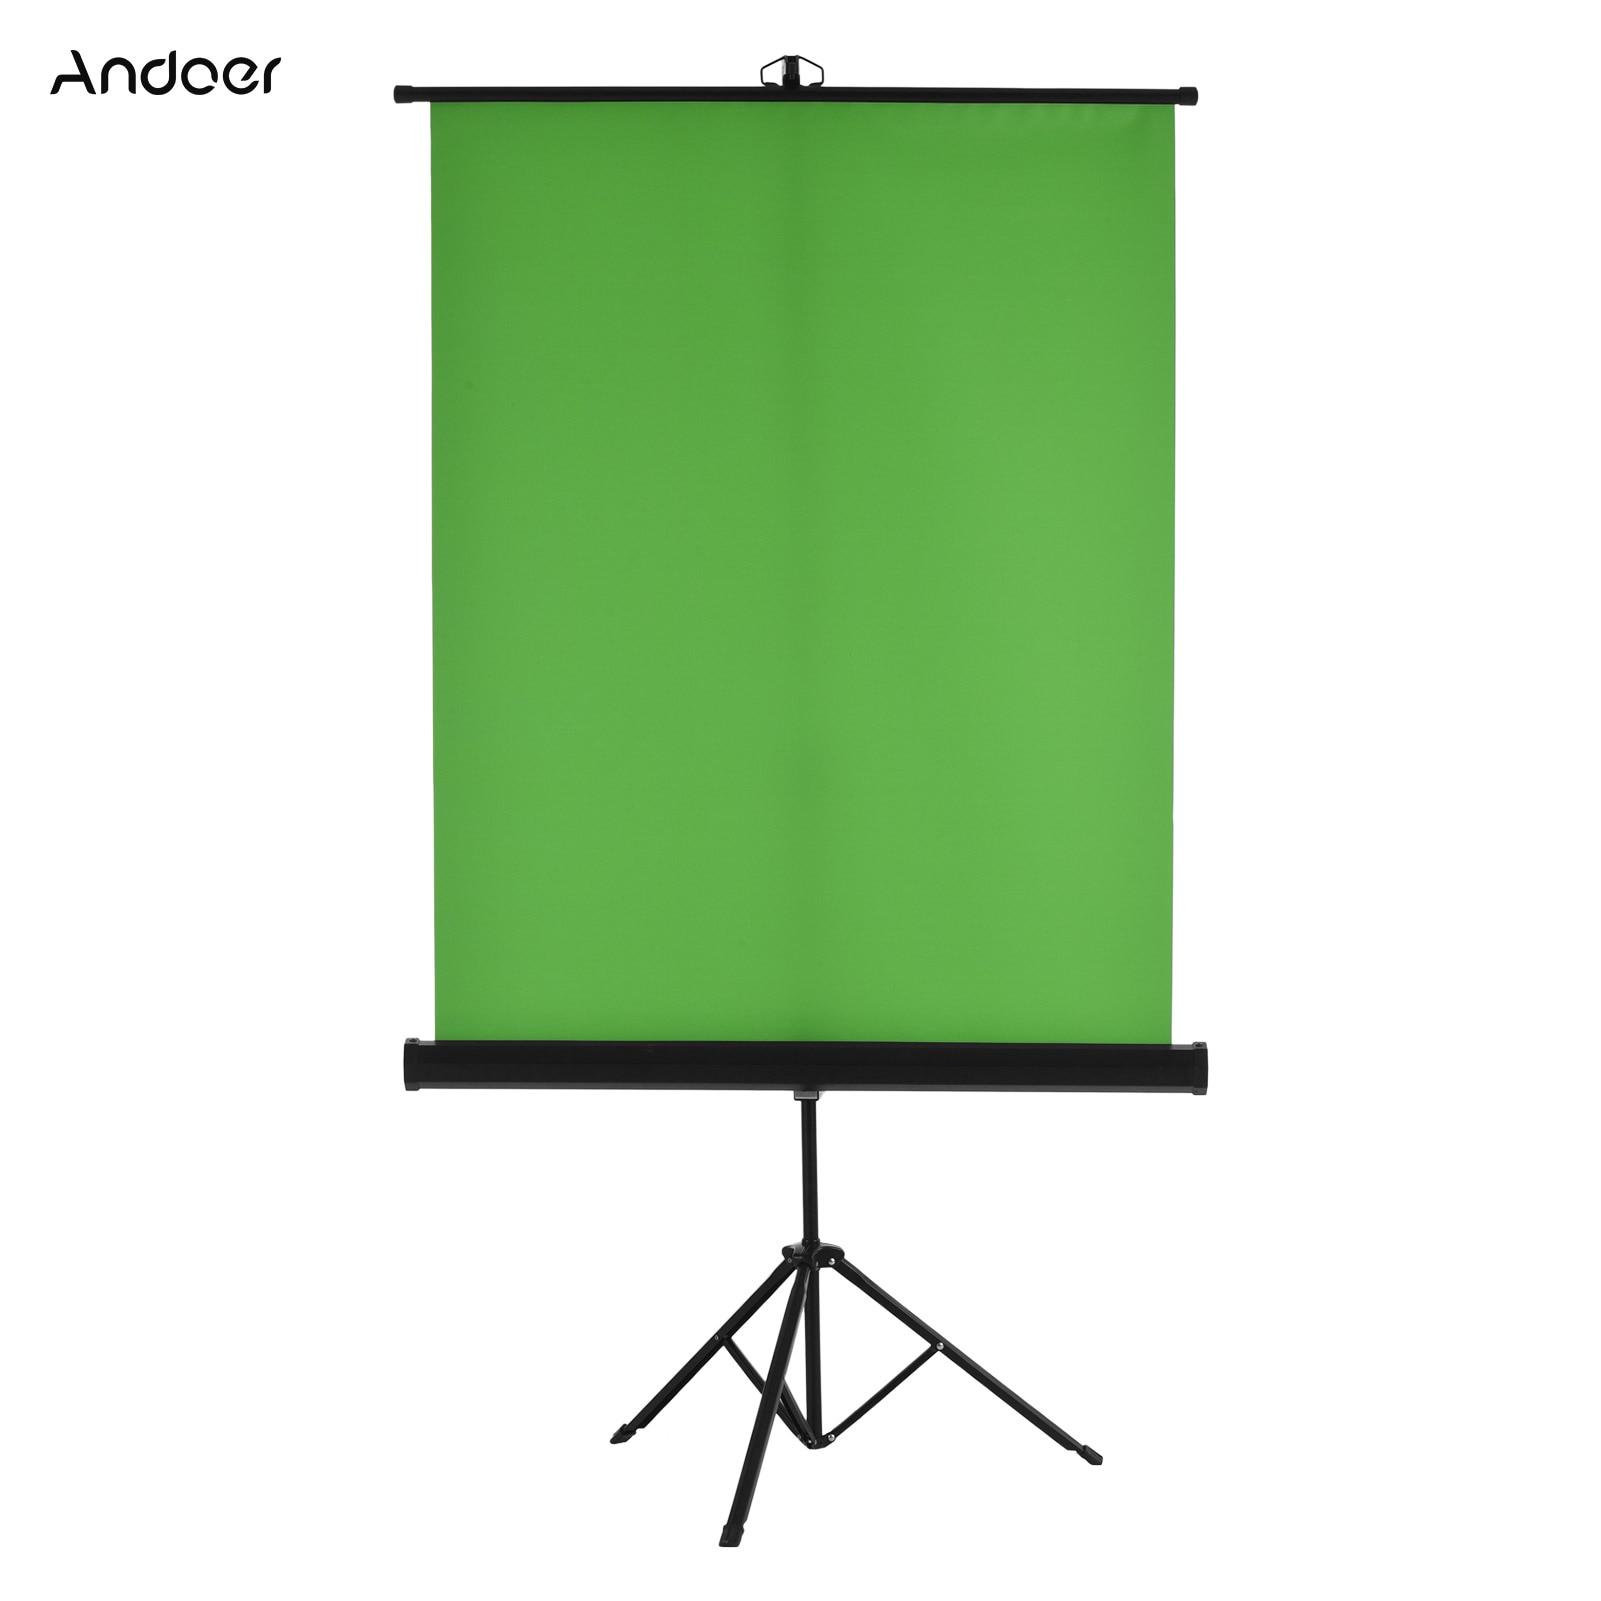 Andoer 1.5*1m/ 4.9 * 3.2ft المحمولة المنقولة شاشة خضراء خلفية كروماكي المهنية مع التجاعيد عالية الجودة